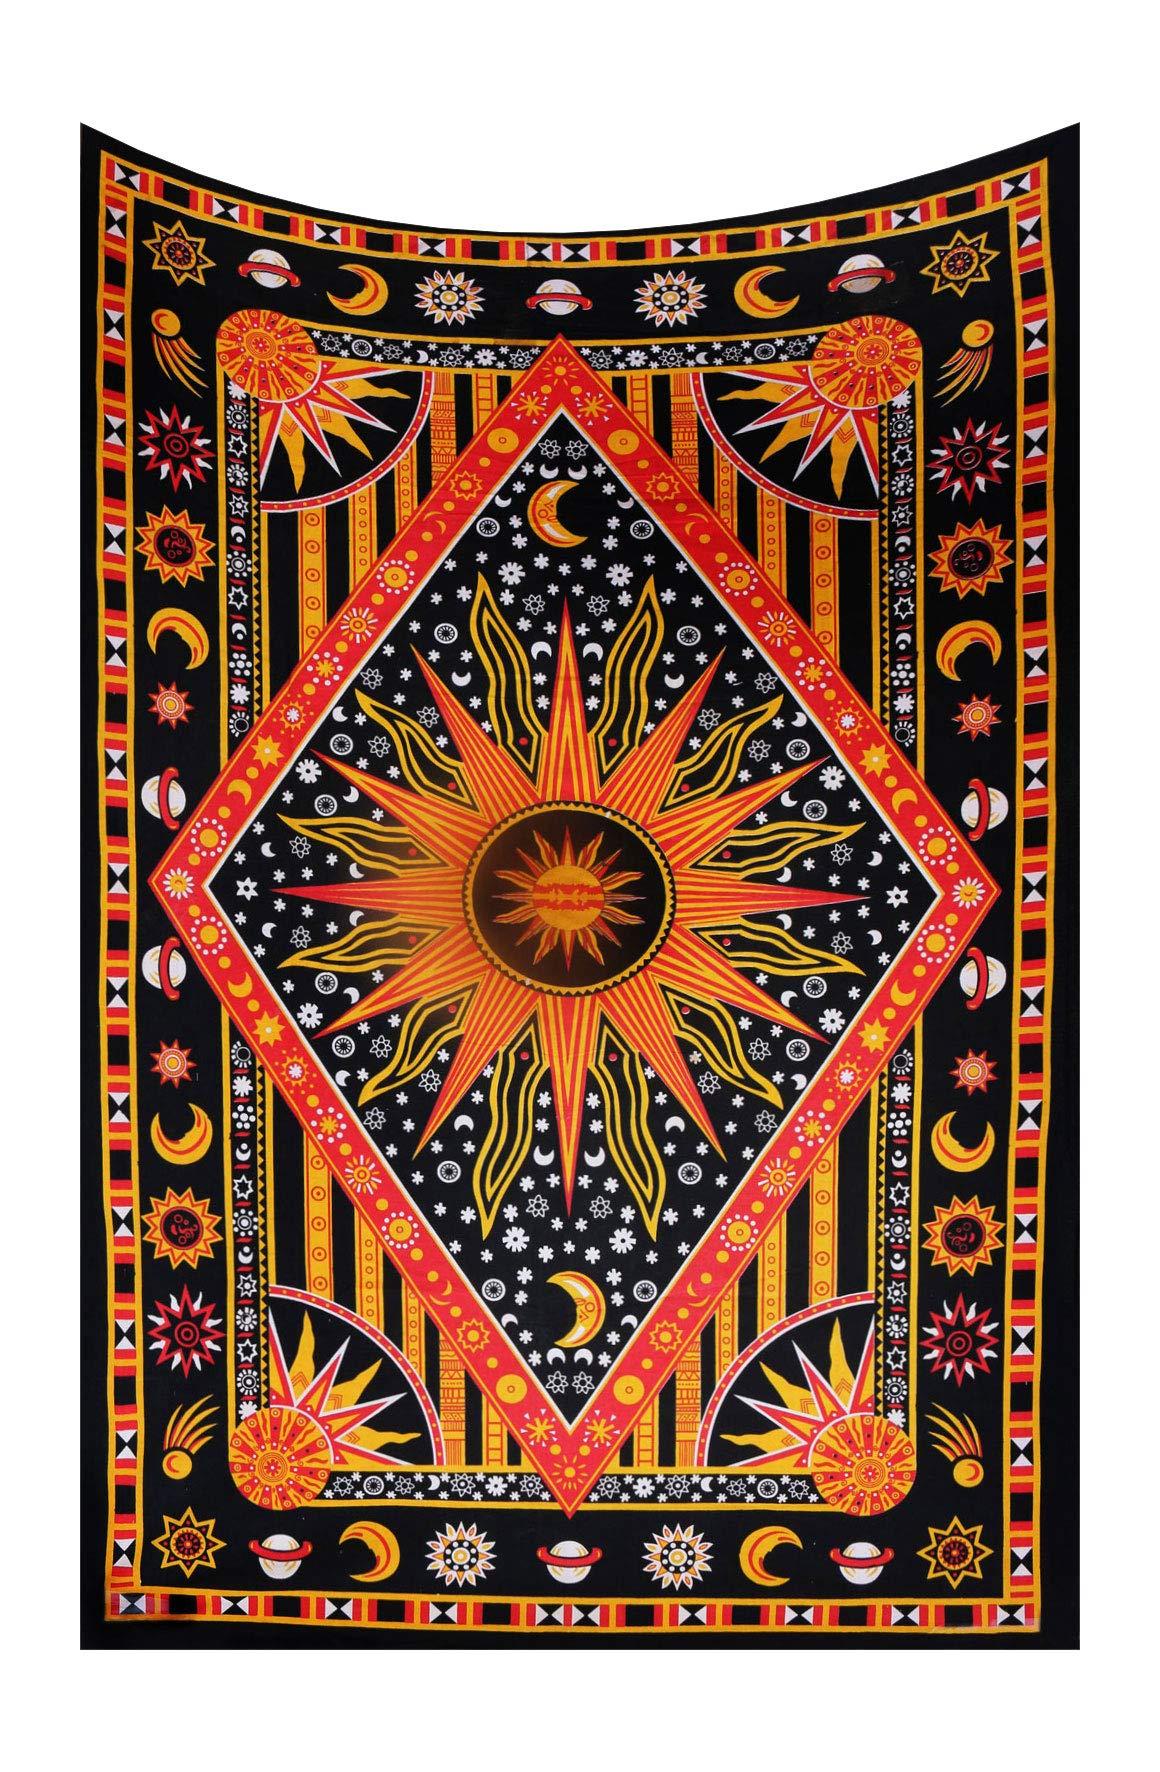 Dorm Decor Wall Hanging Hippie Tapestry Bohemian Indian Sun Moon Star Mandala